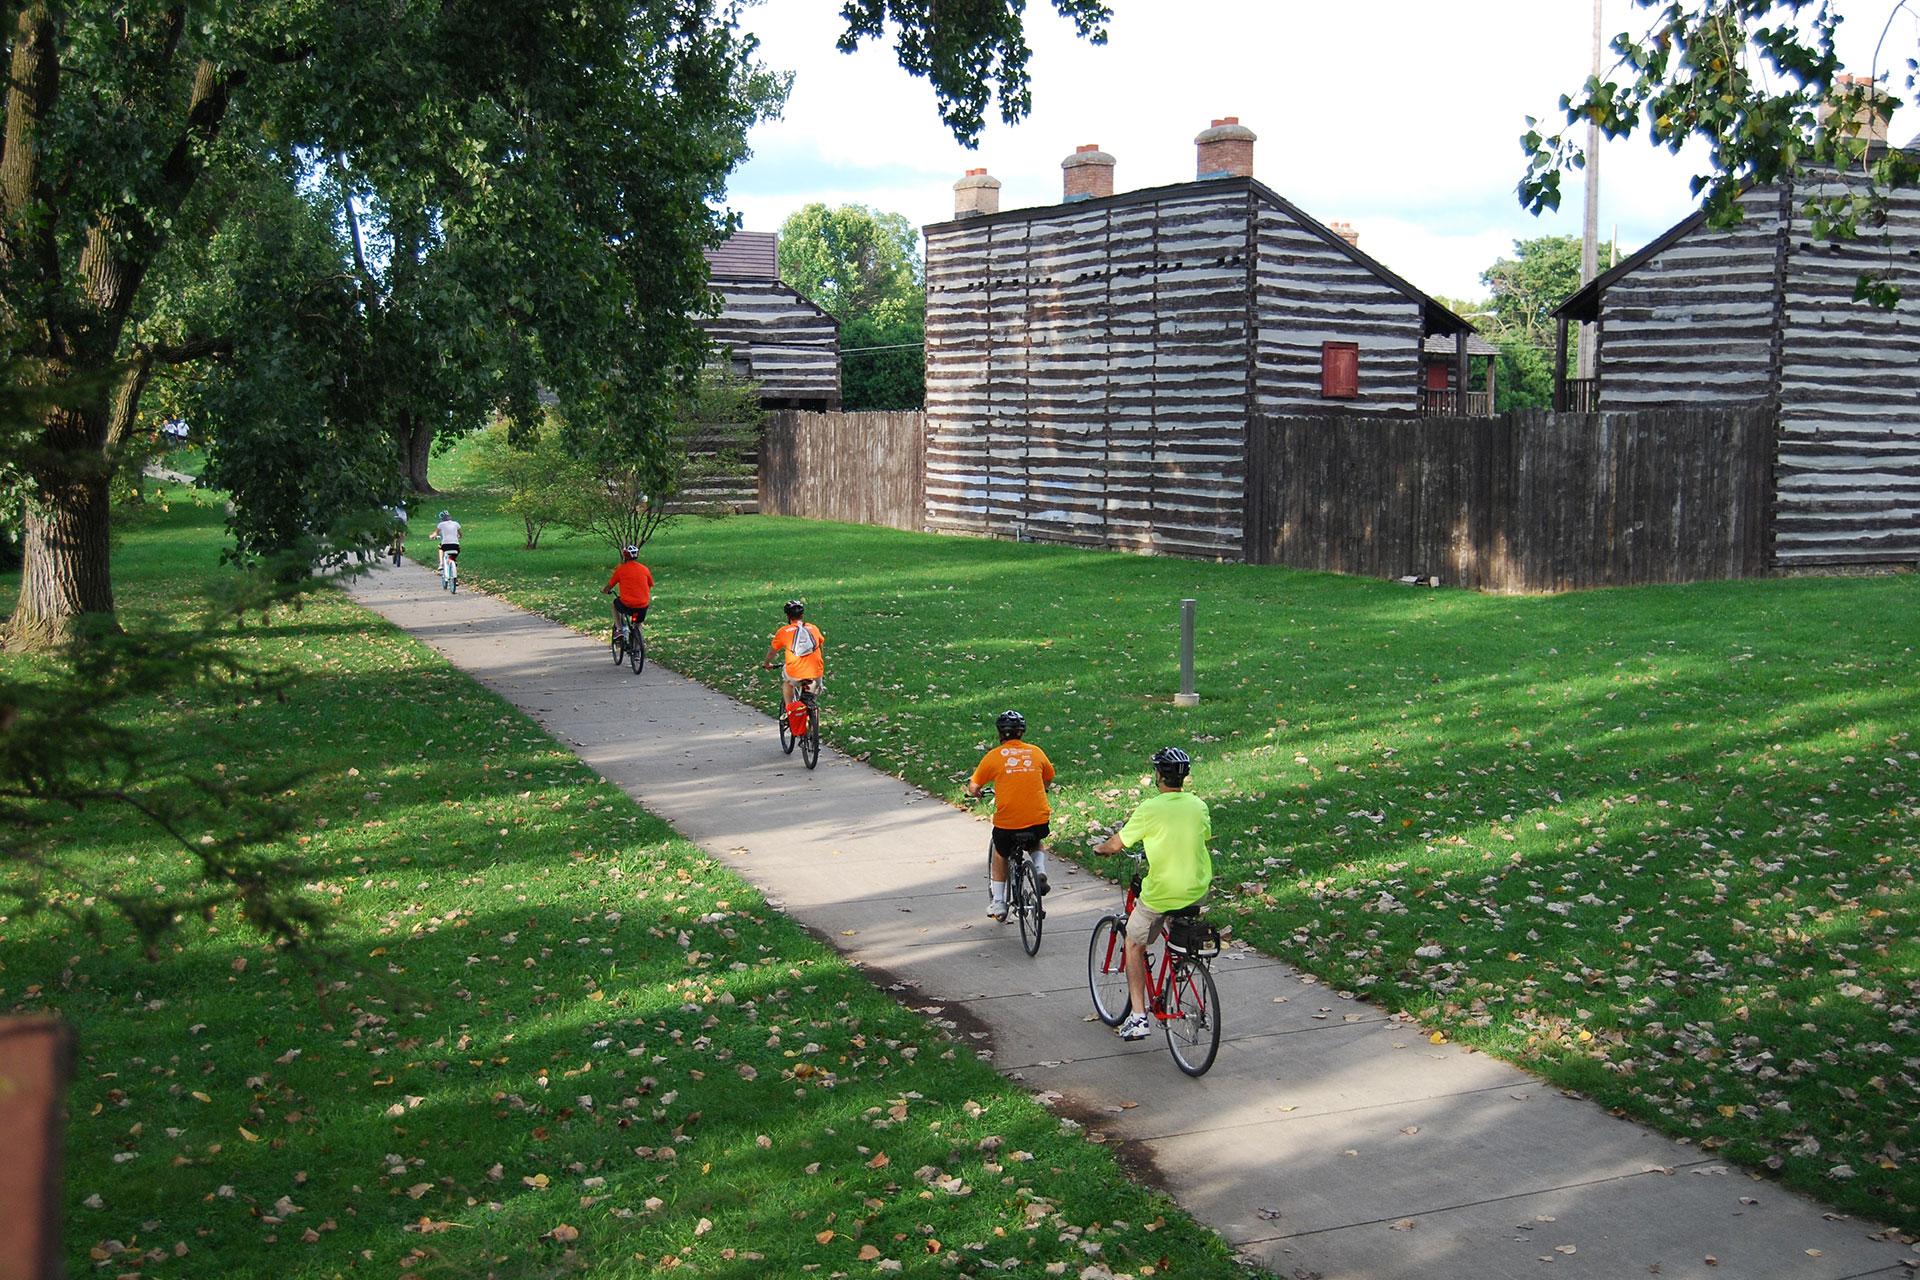 Biking in Fort Wayne